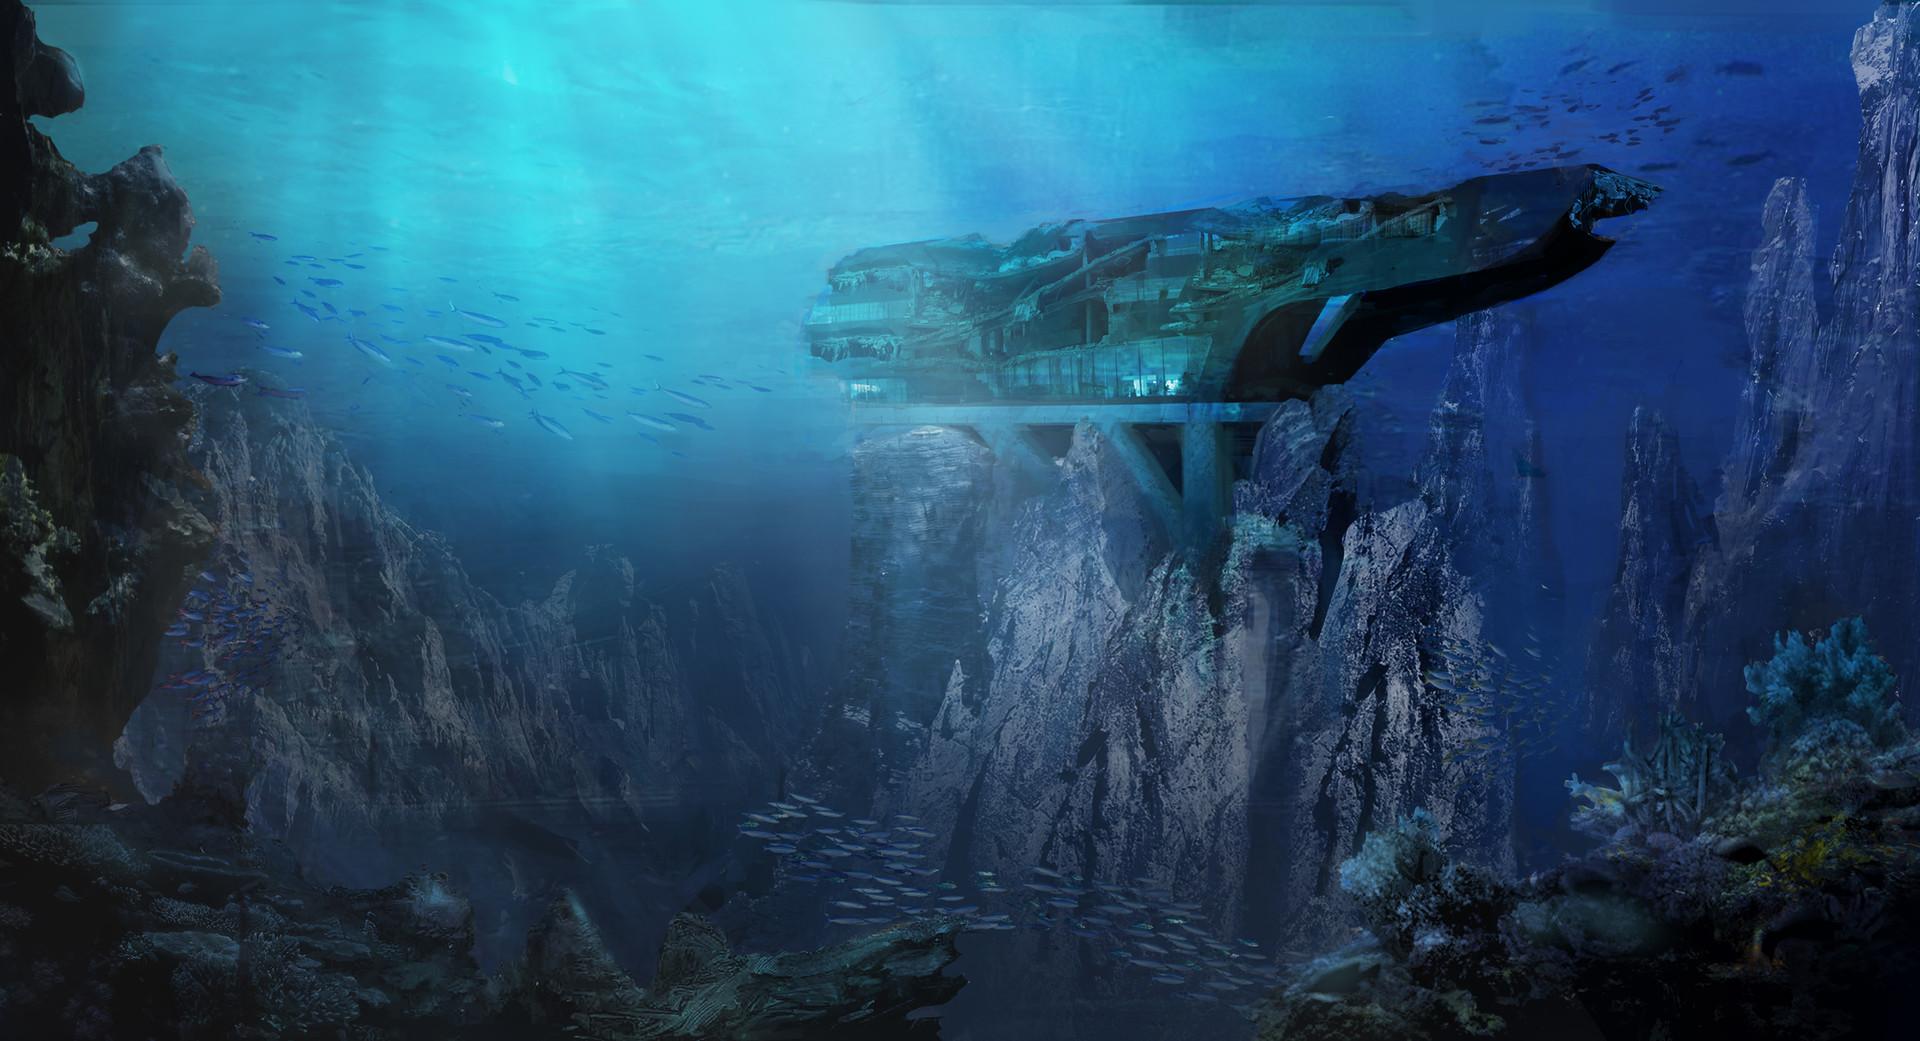 3d Wallpaper Under The Sea Artstation Concept Design Underwater Research Facility